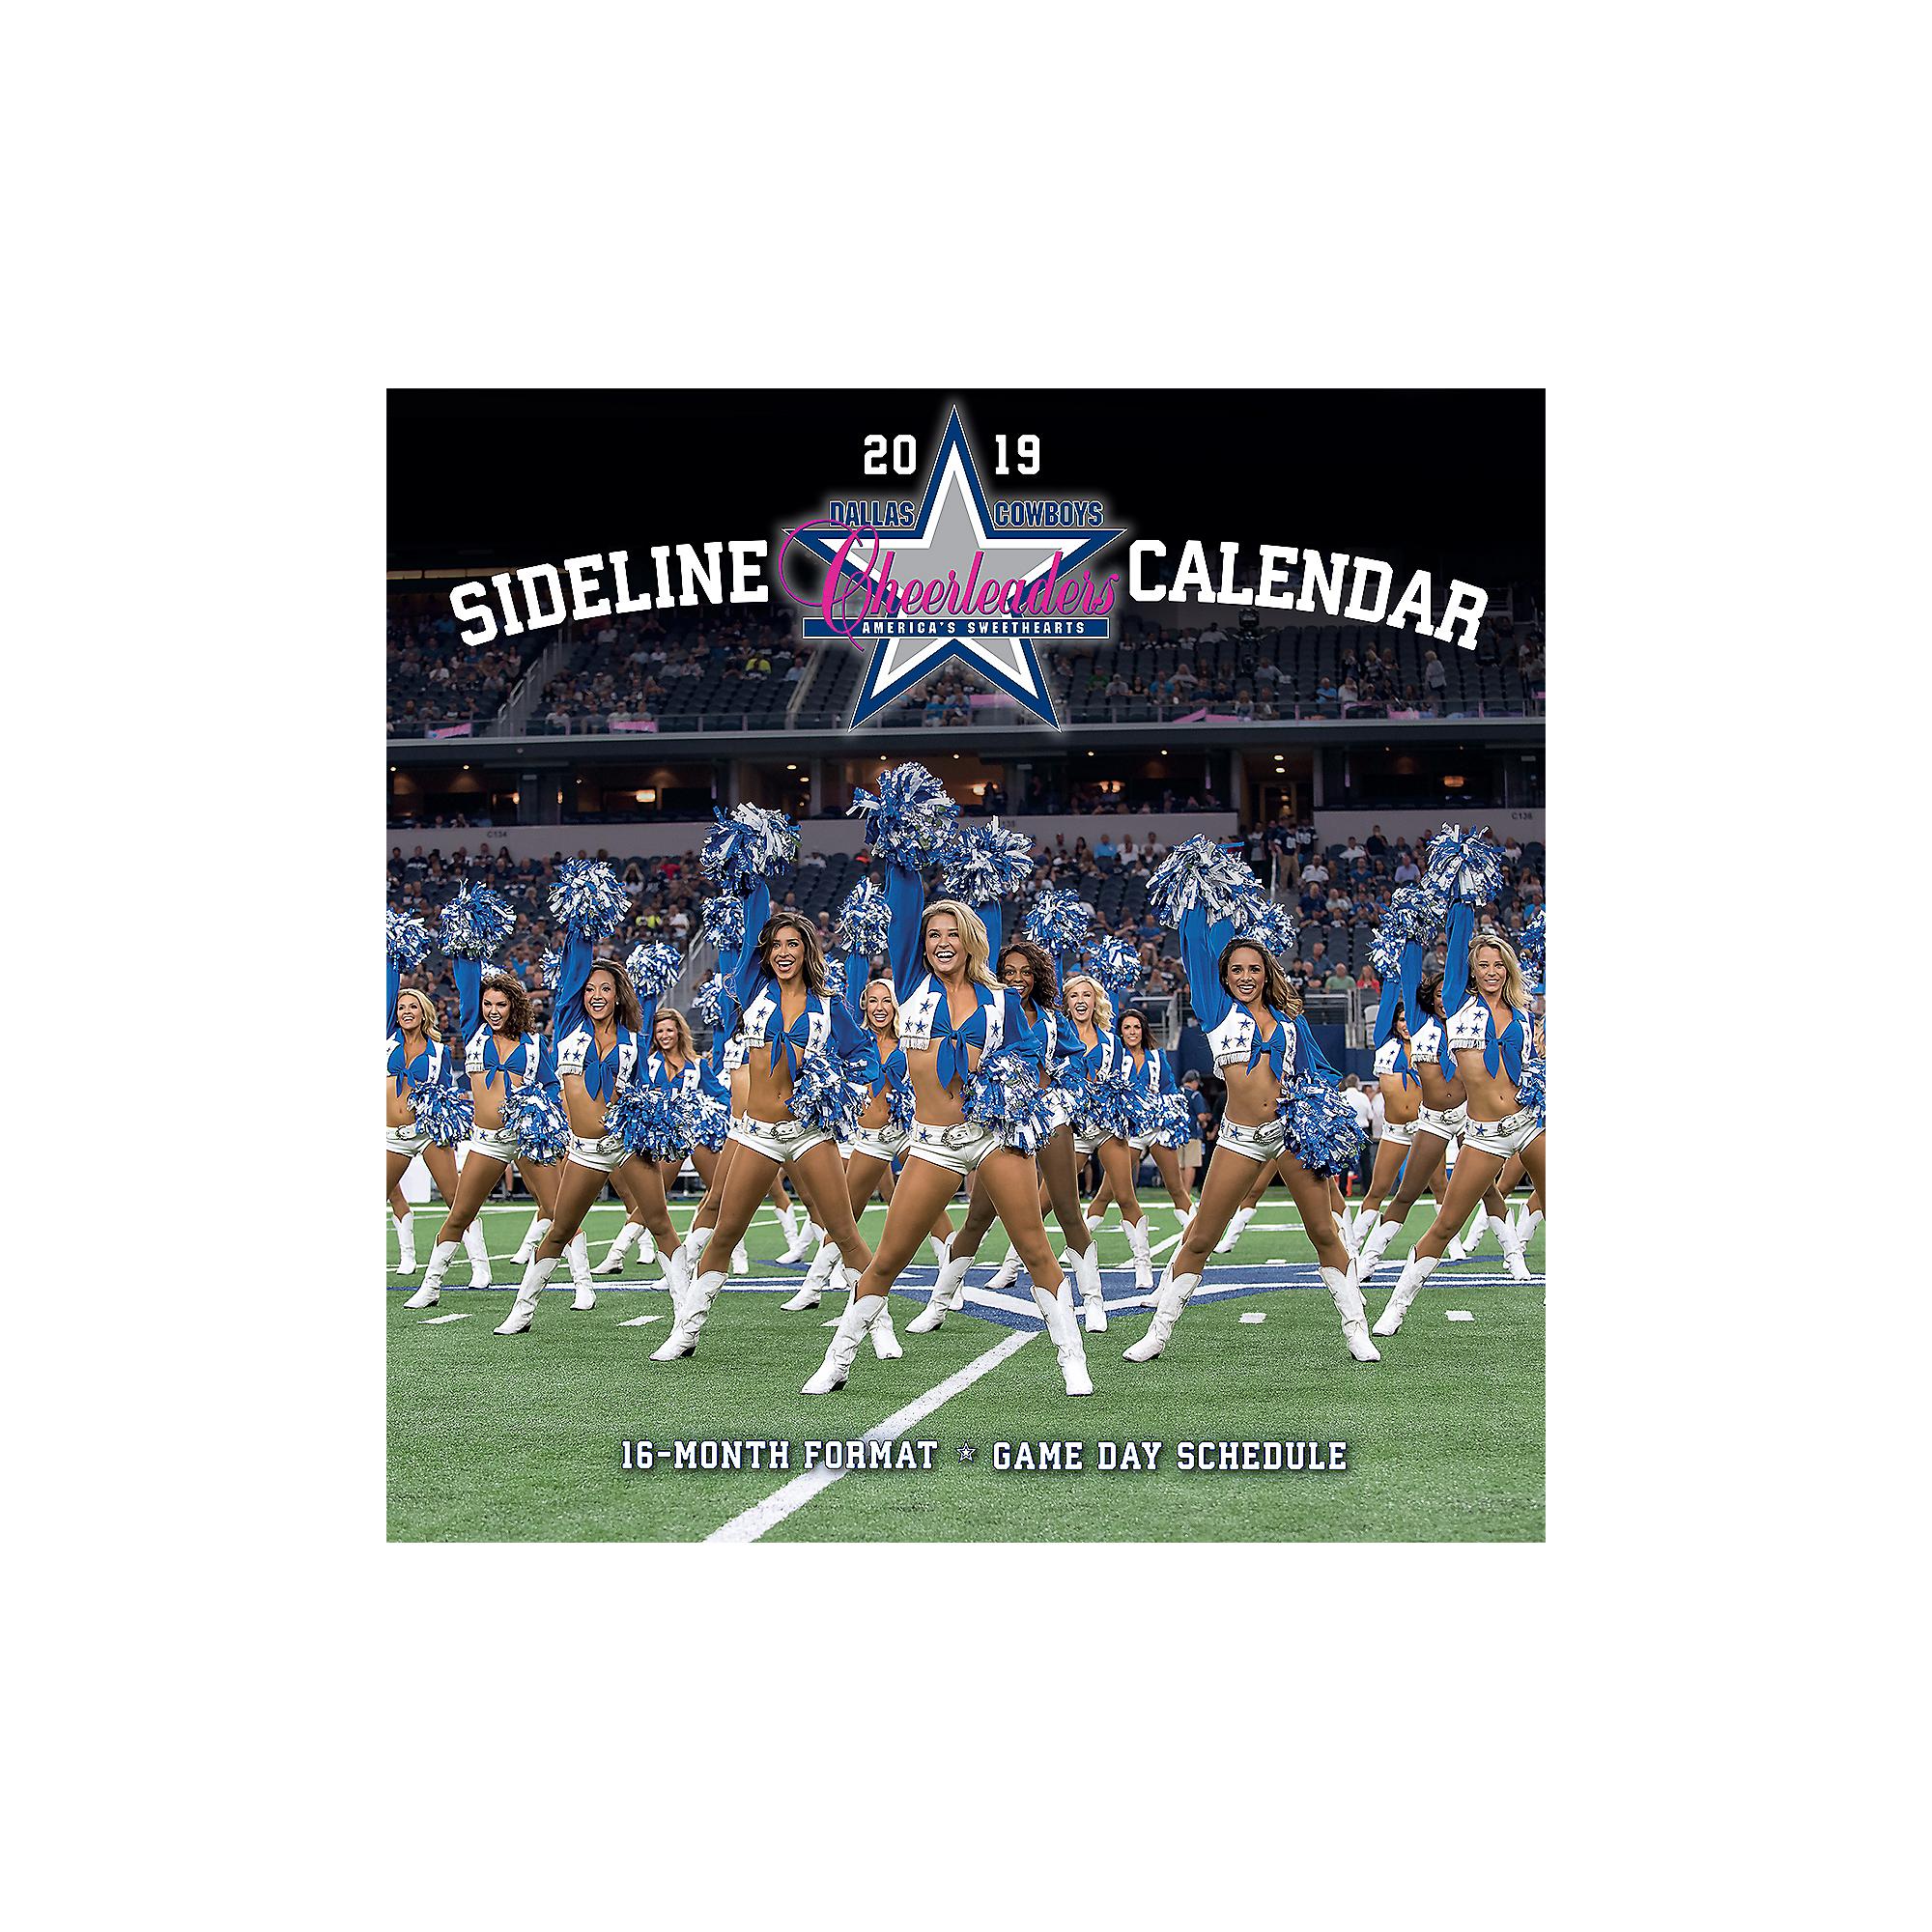 2019 12x12 Dallas Cowboys Cheerleaders Sideline Wall Calendar